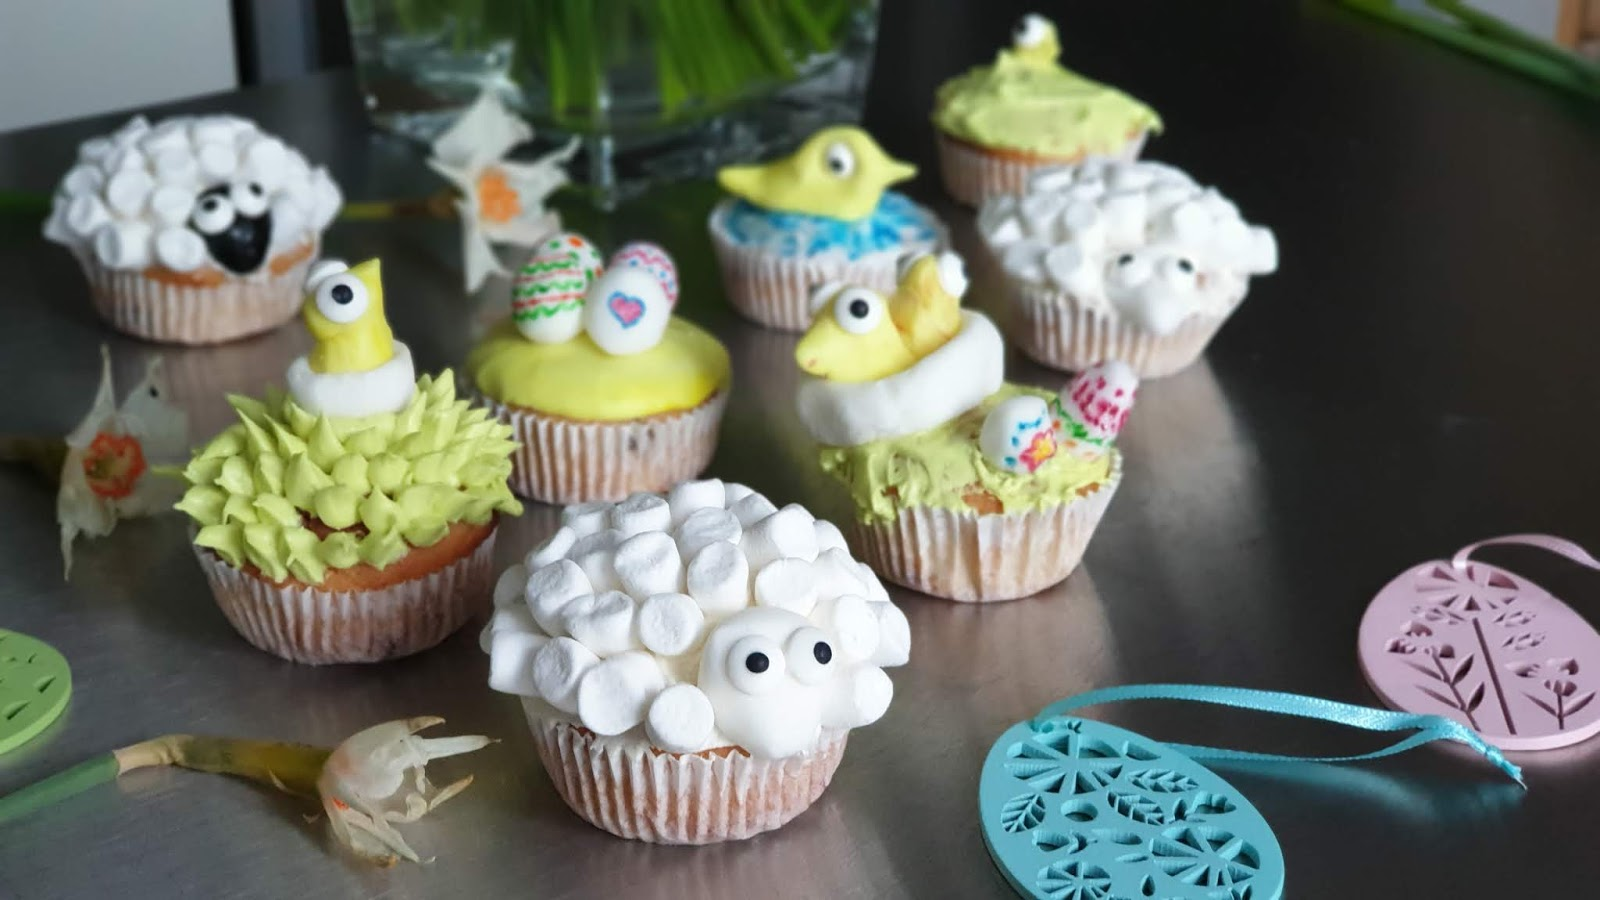 chick cupcake, egg cupcake, lamb cupcake